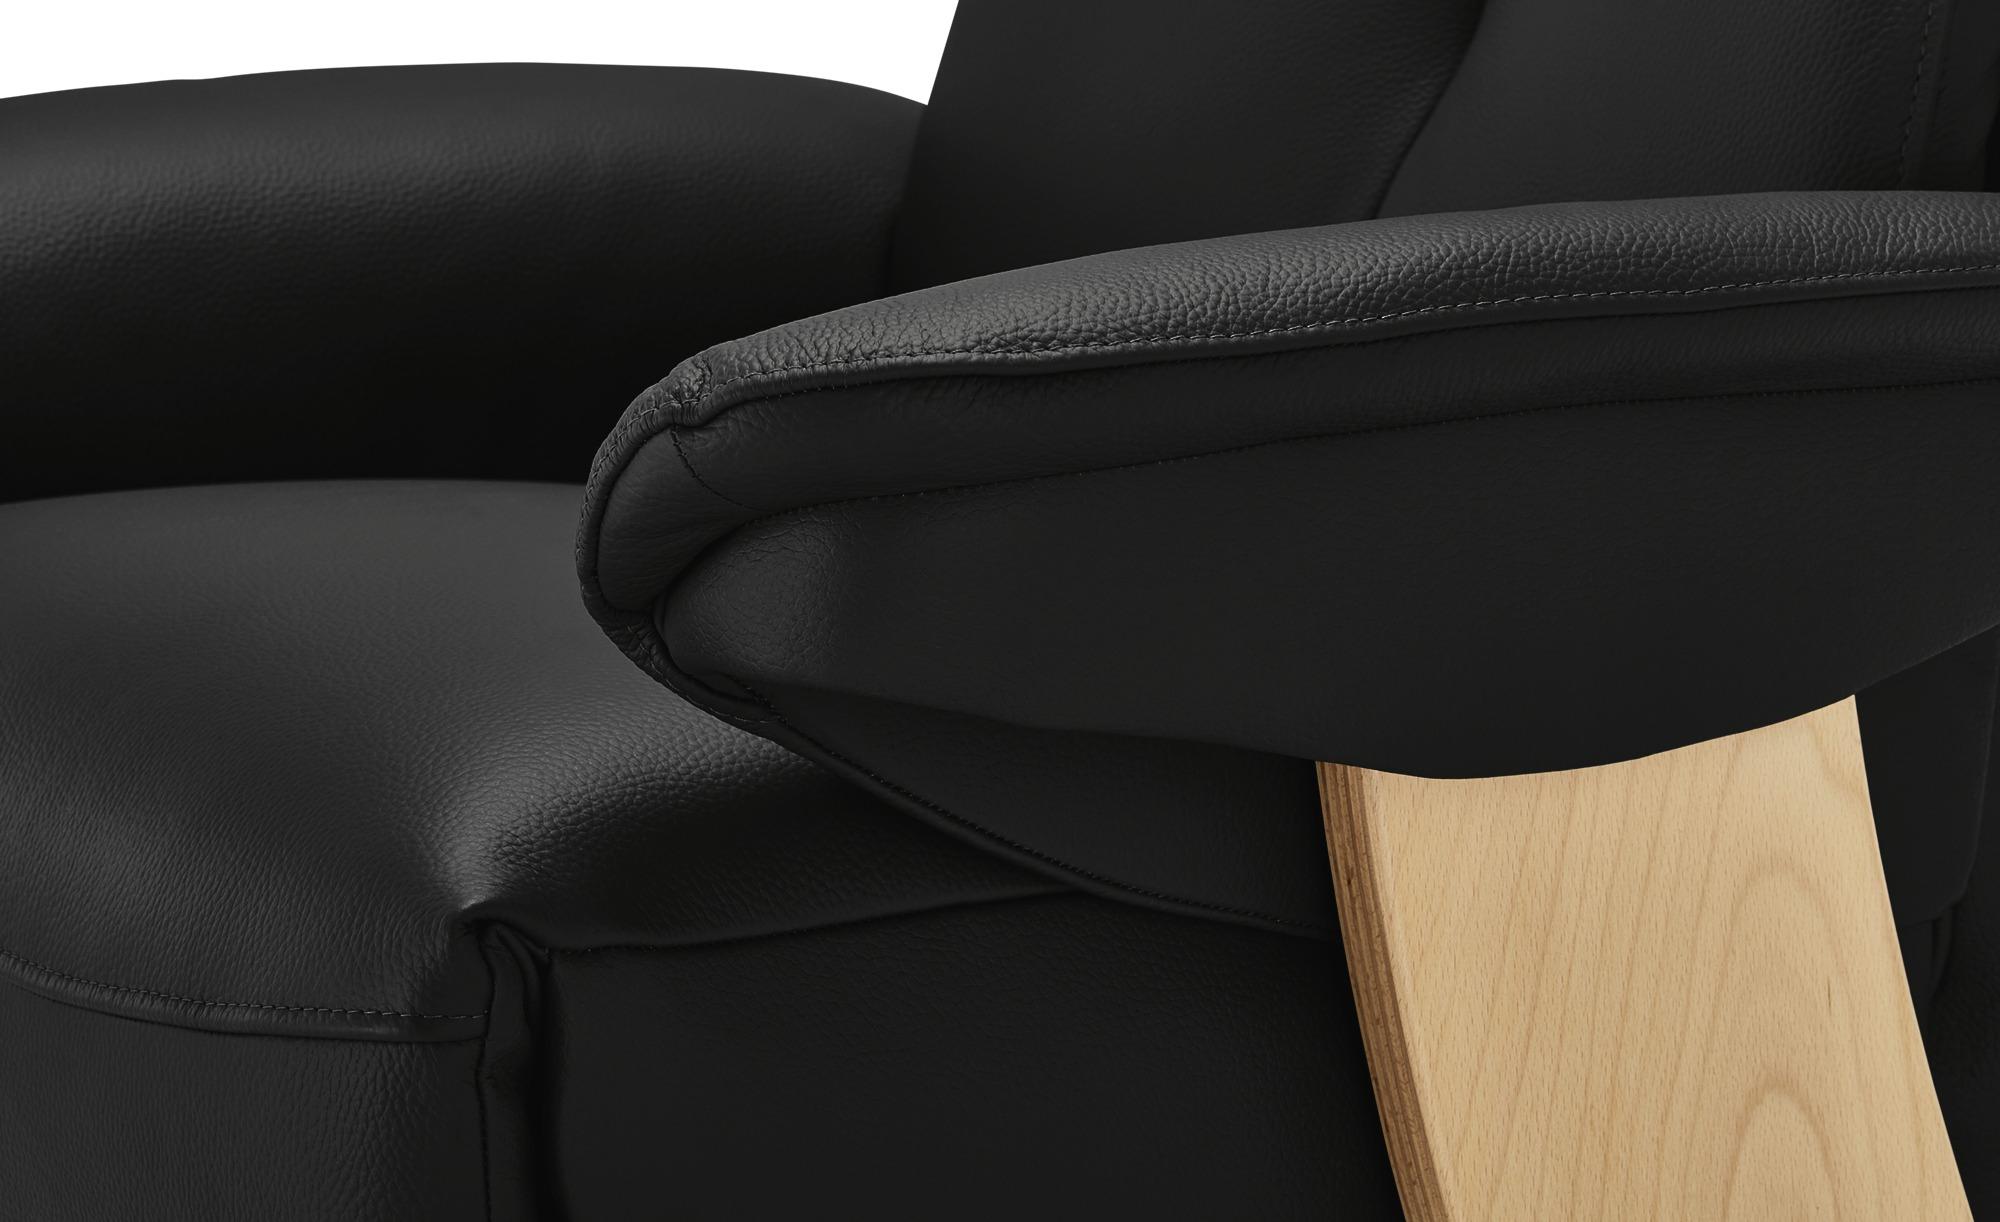 Relaxsessel  Svenstrup ¦ grau ¦ Maße (cm): B: 76 H: 108 T: 81 Polstermöbel > Sessel > Ledersessel - Höffner